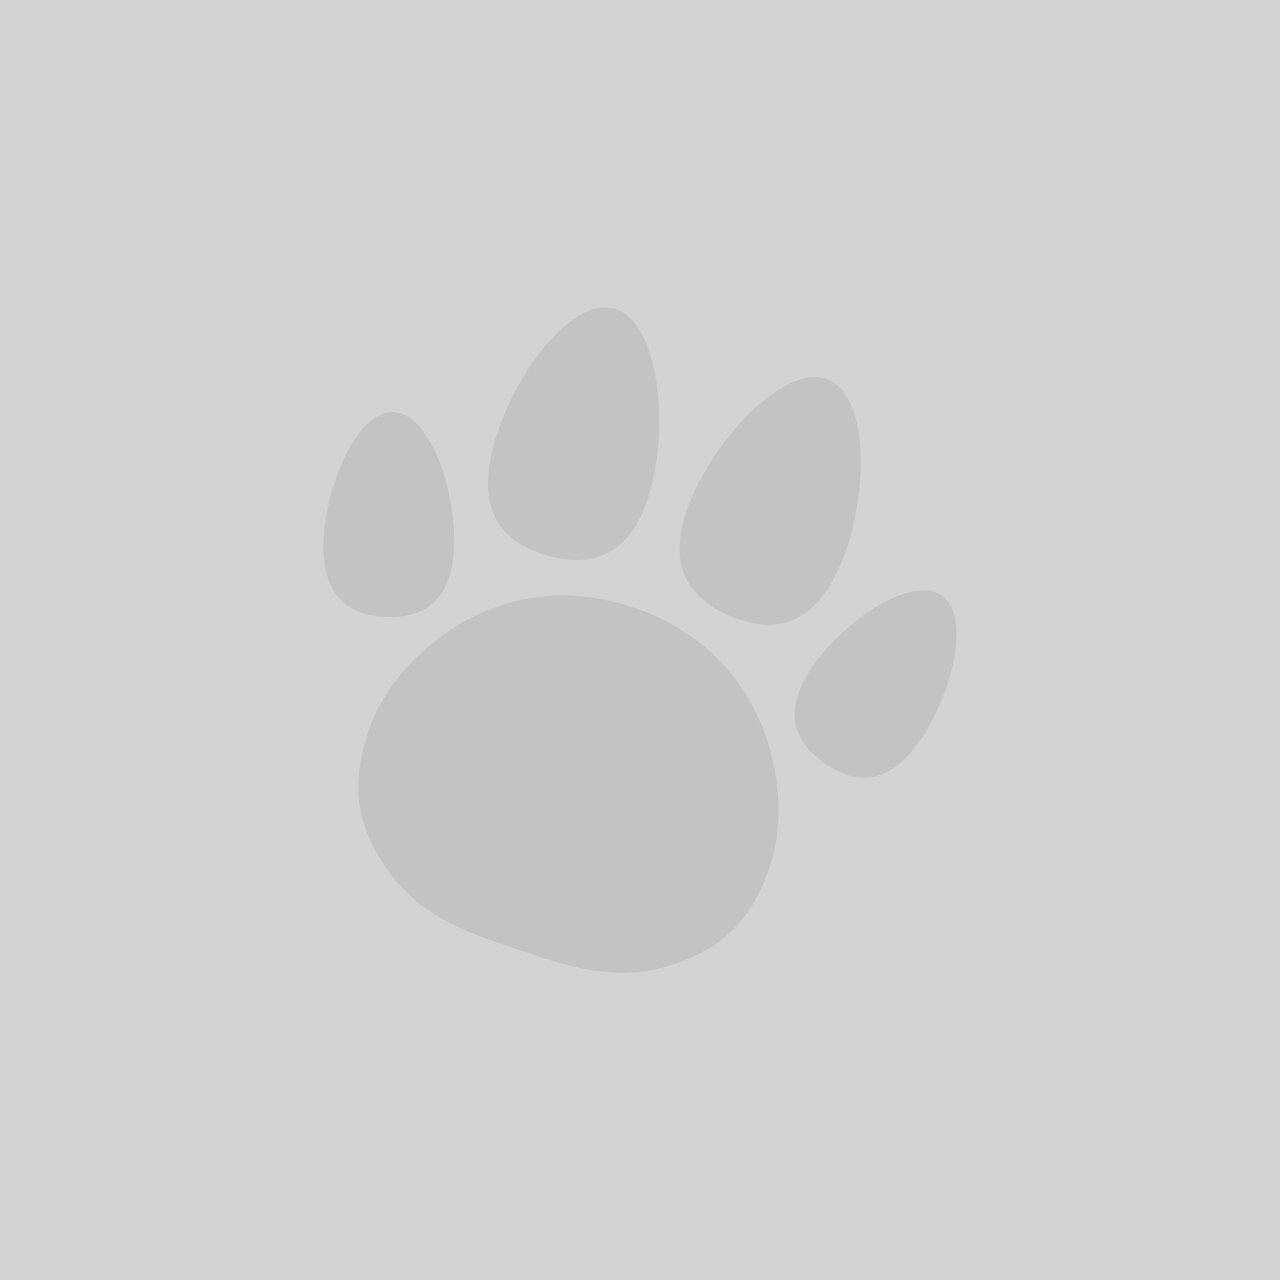 Greenies Grain Free Large Dog Dental Treat 170g